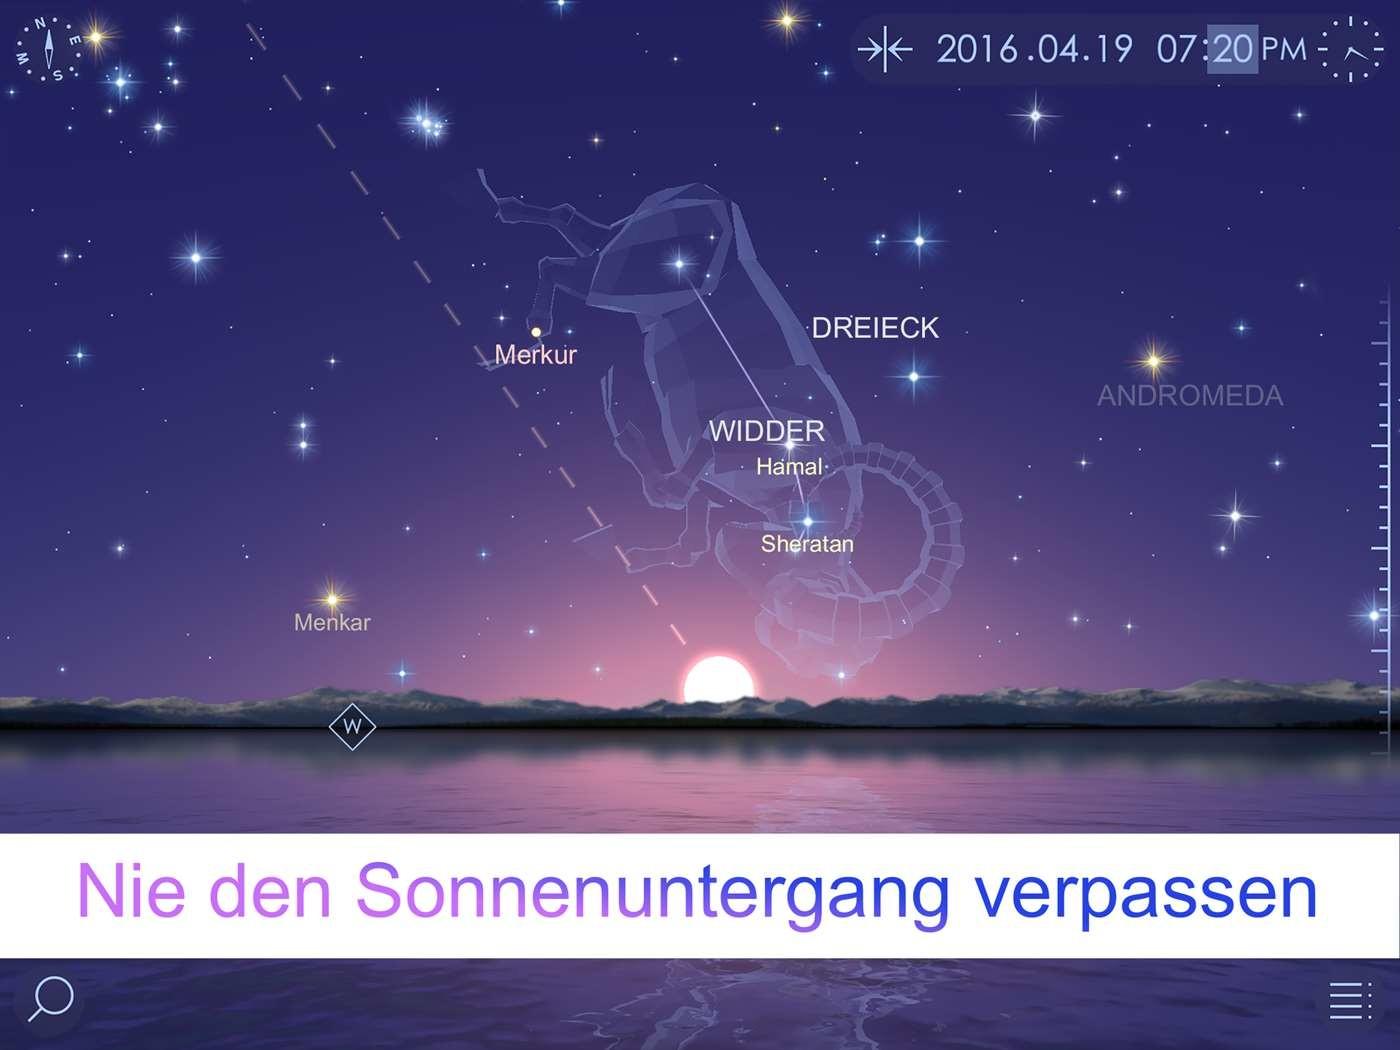 Screenshot 1 - Star Walk 2 (Windows-10-App)